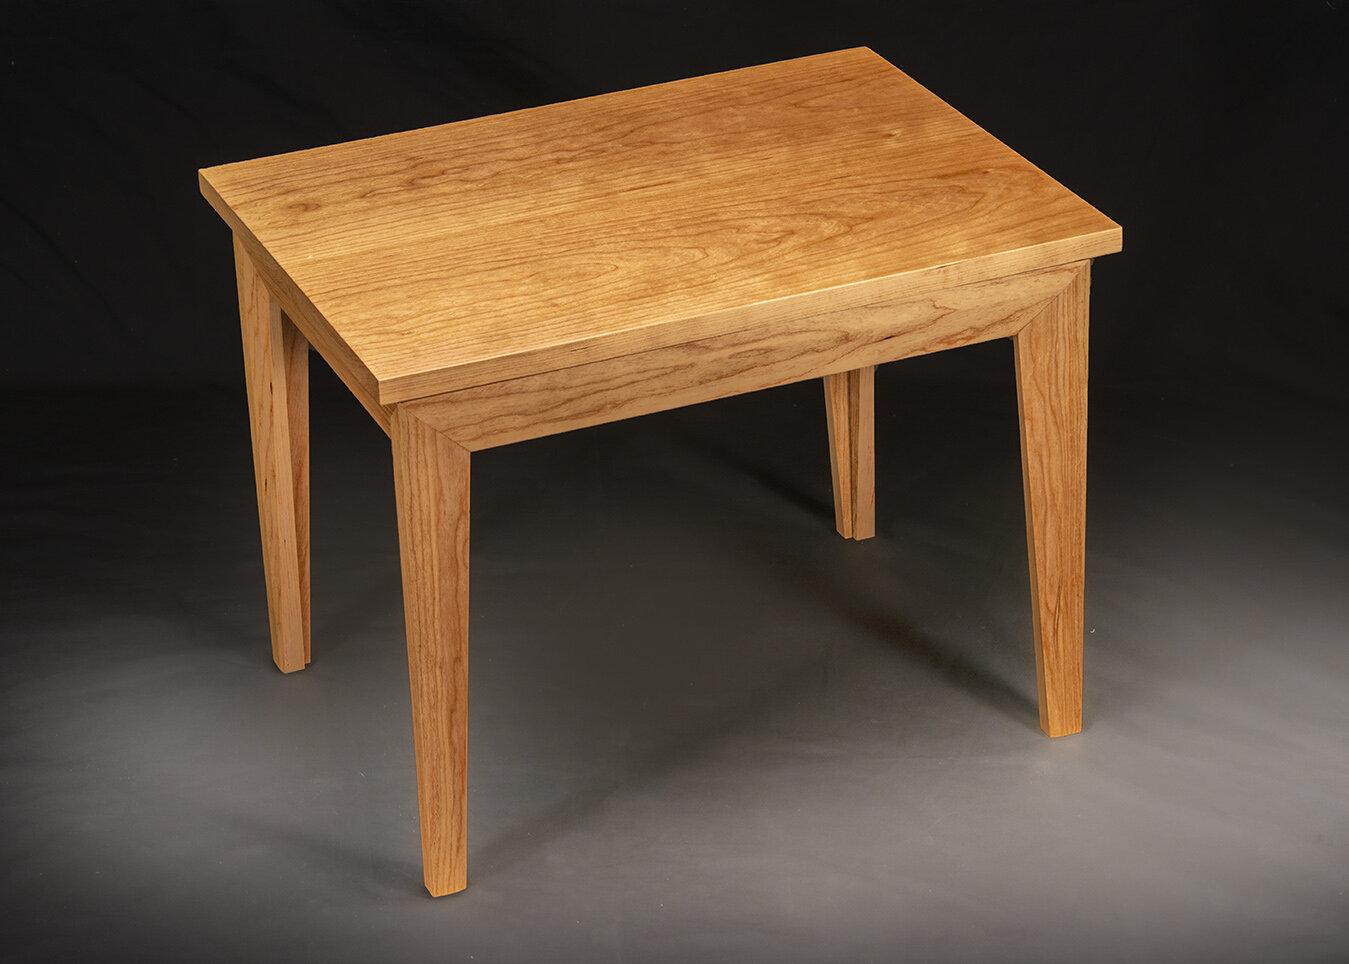 laughlin table 9367-sm.jpg